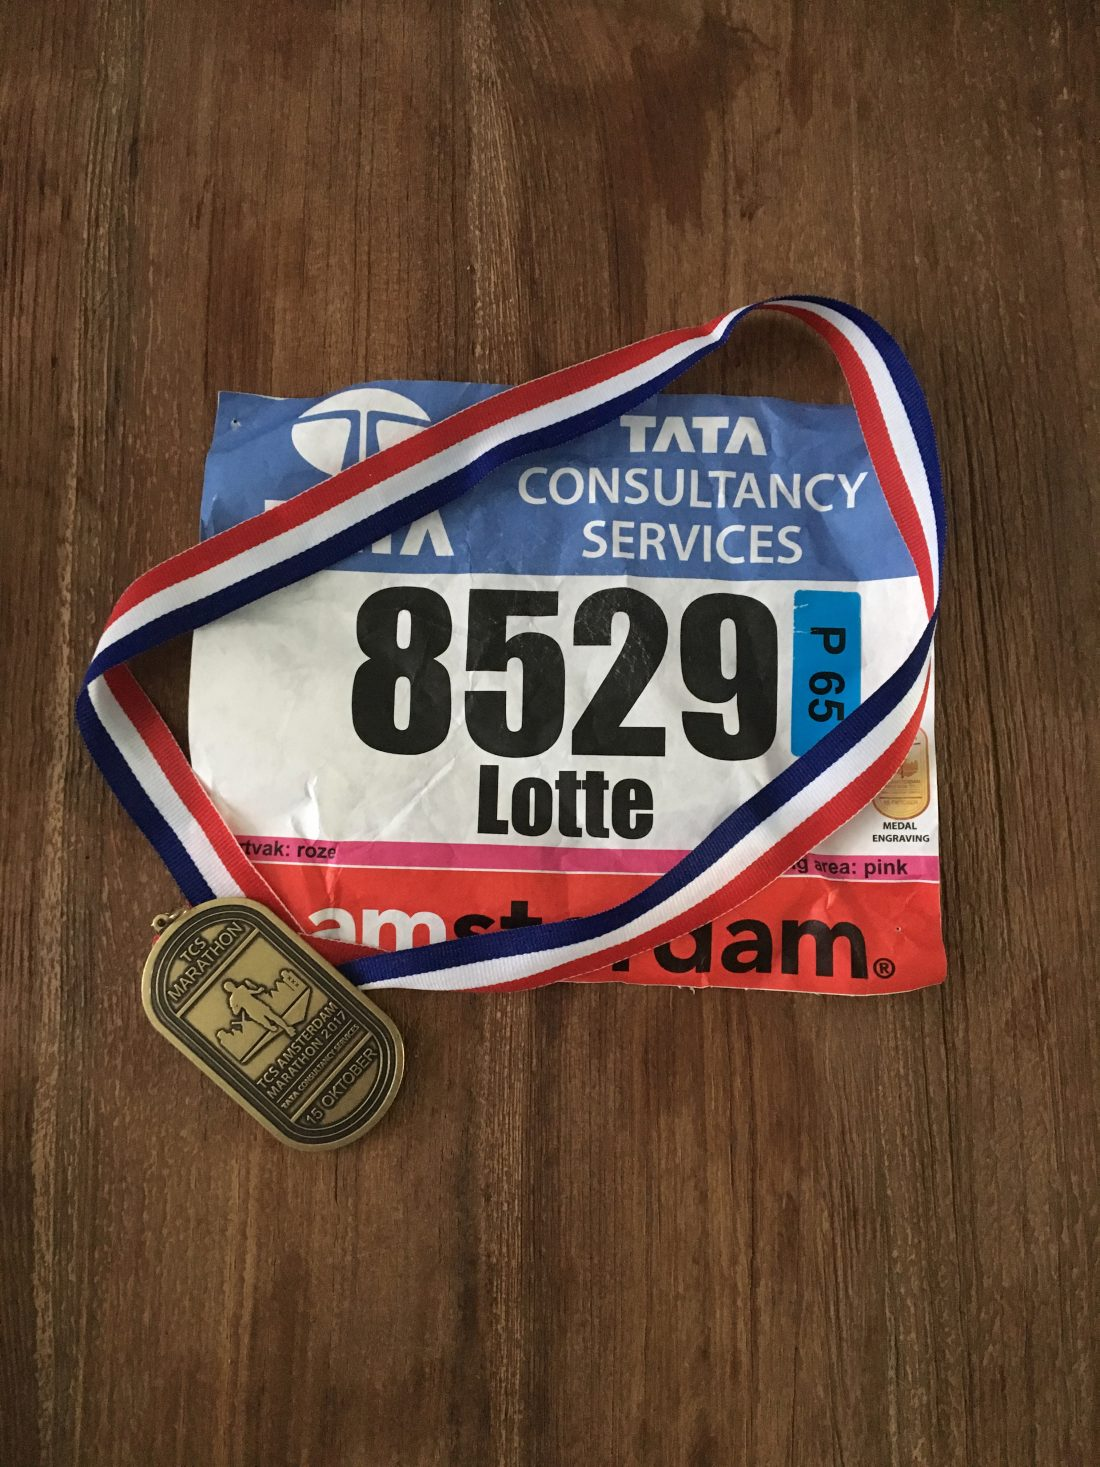 Medal week - TCS amsterdam marathon